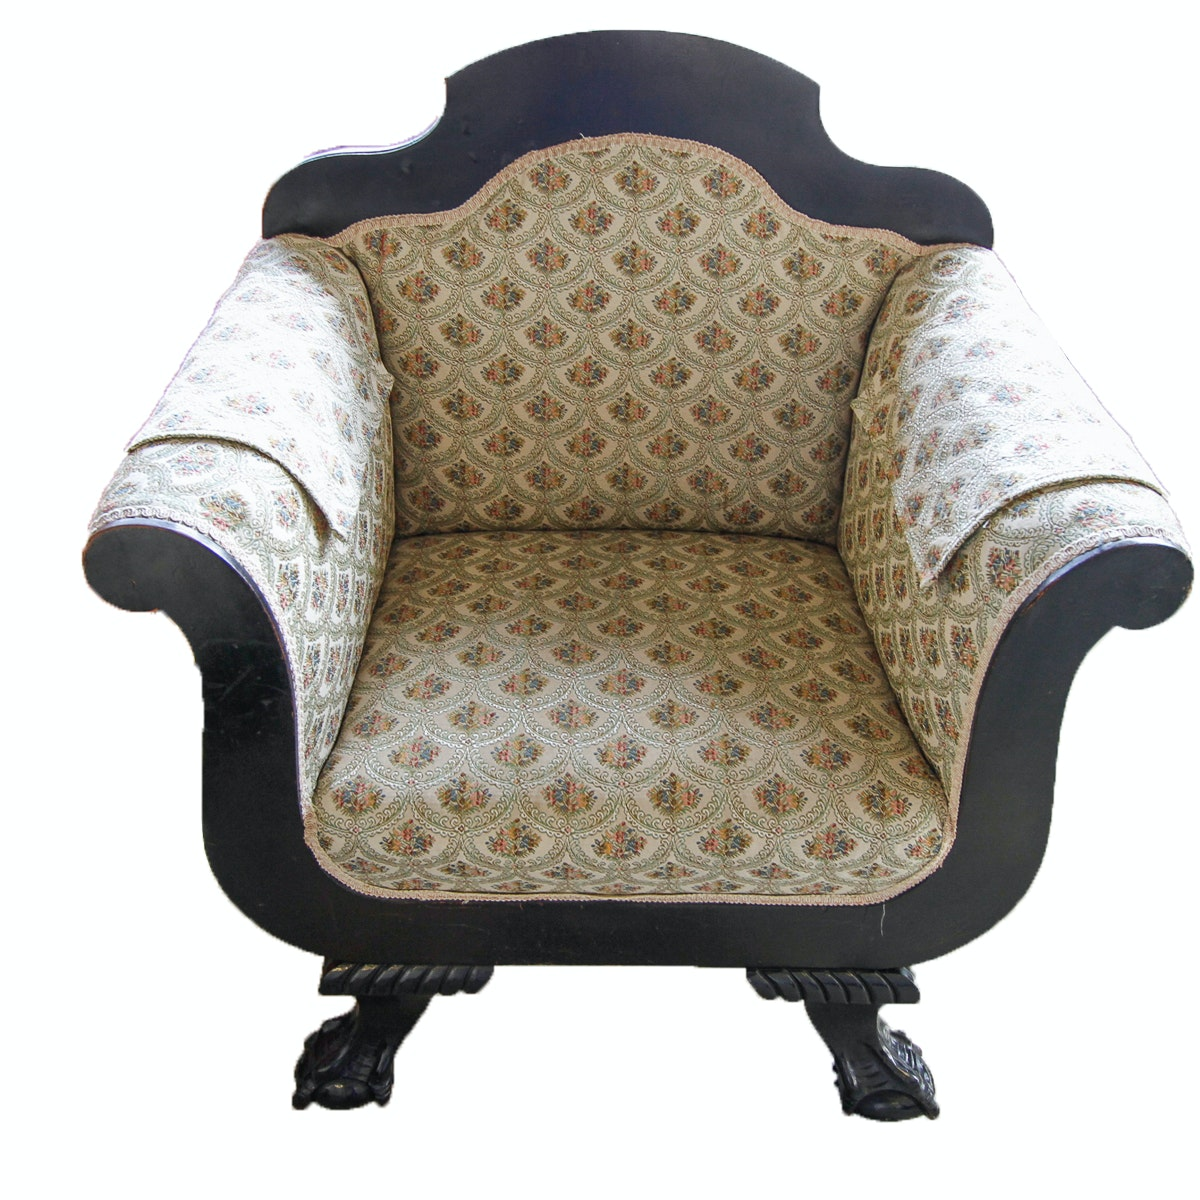 Vintage Empire Style Armchair